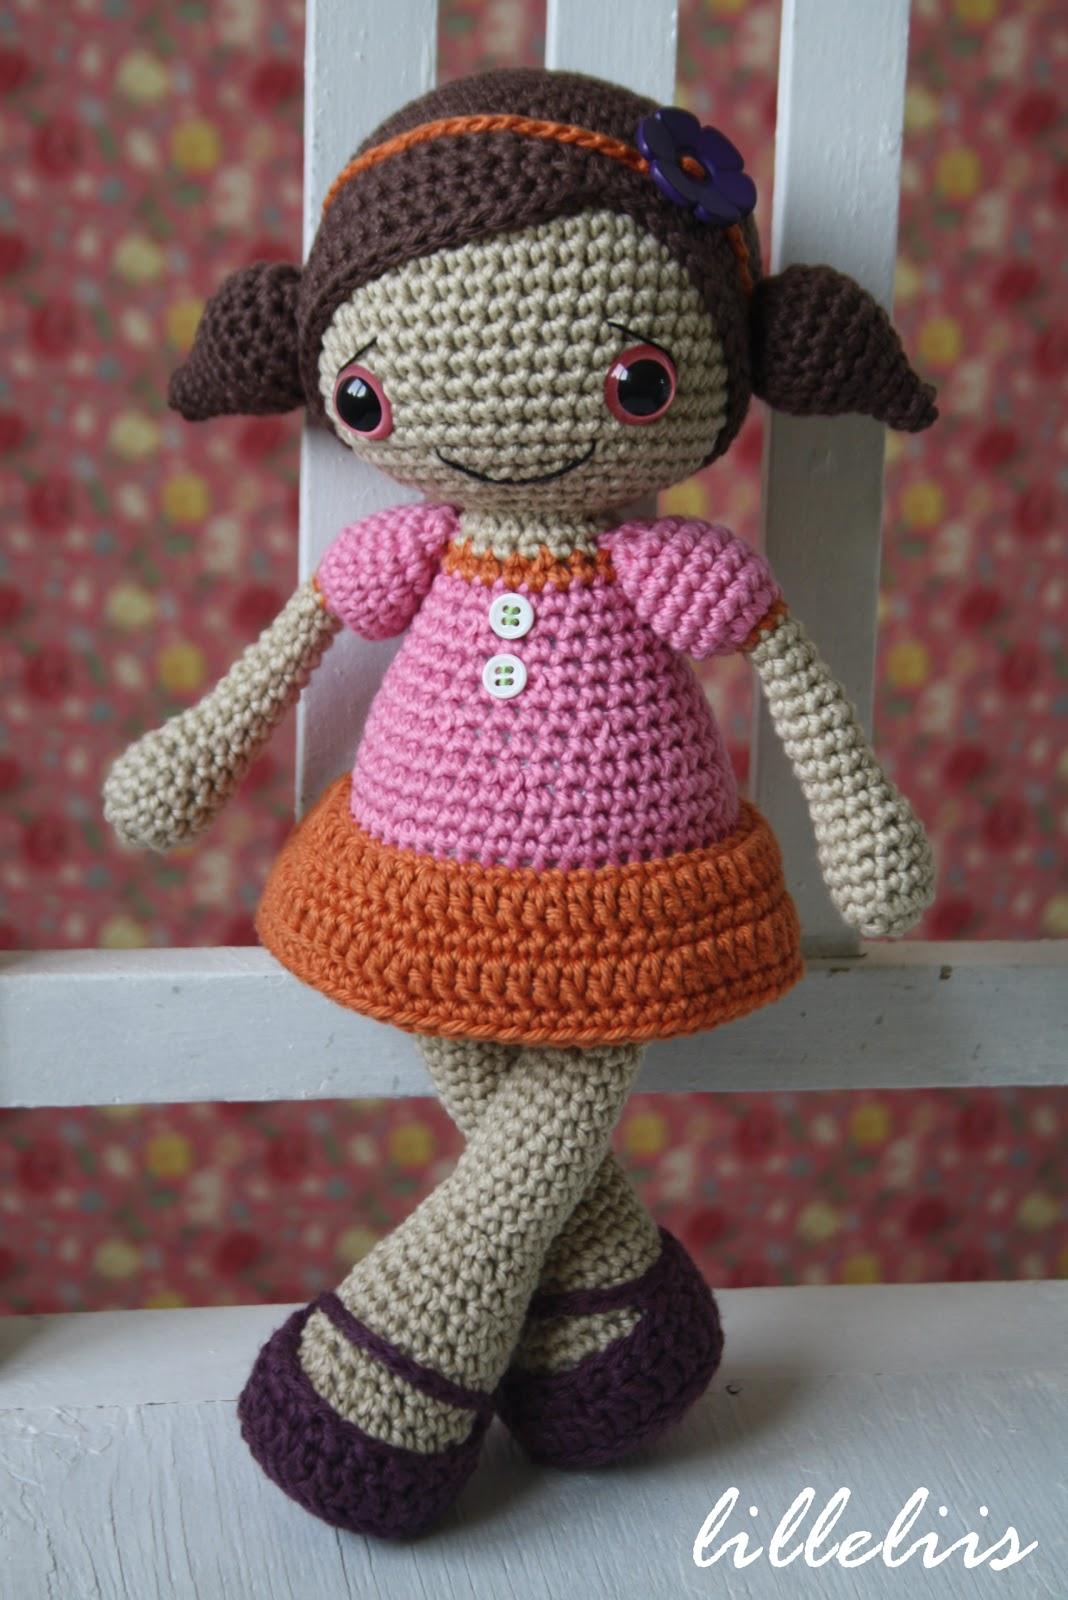 Lilleliis Blogspot Com Sofia Heegeldatud Nukk Crochet Doll